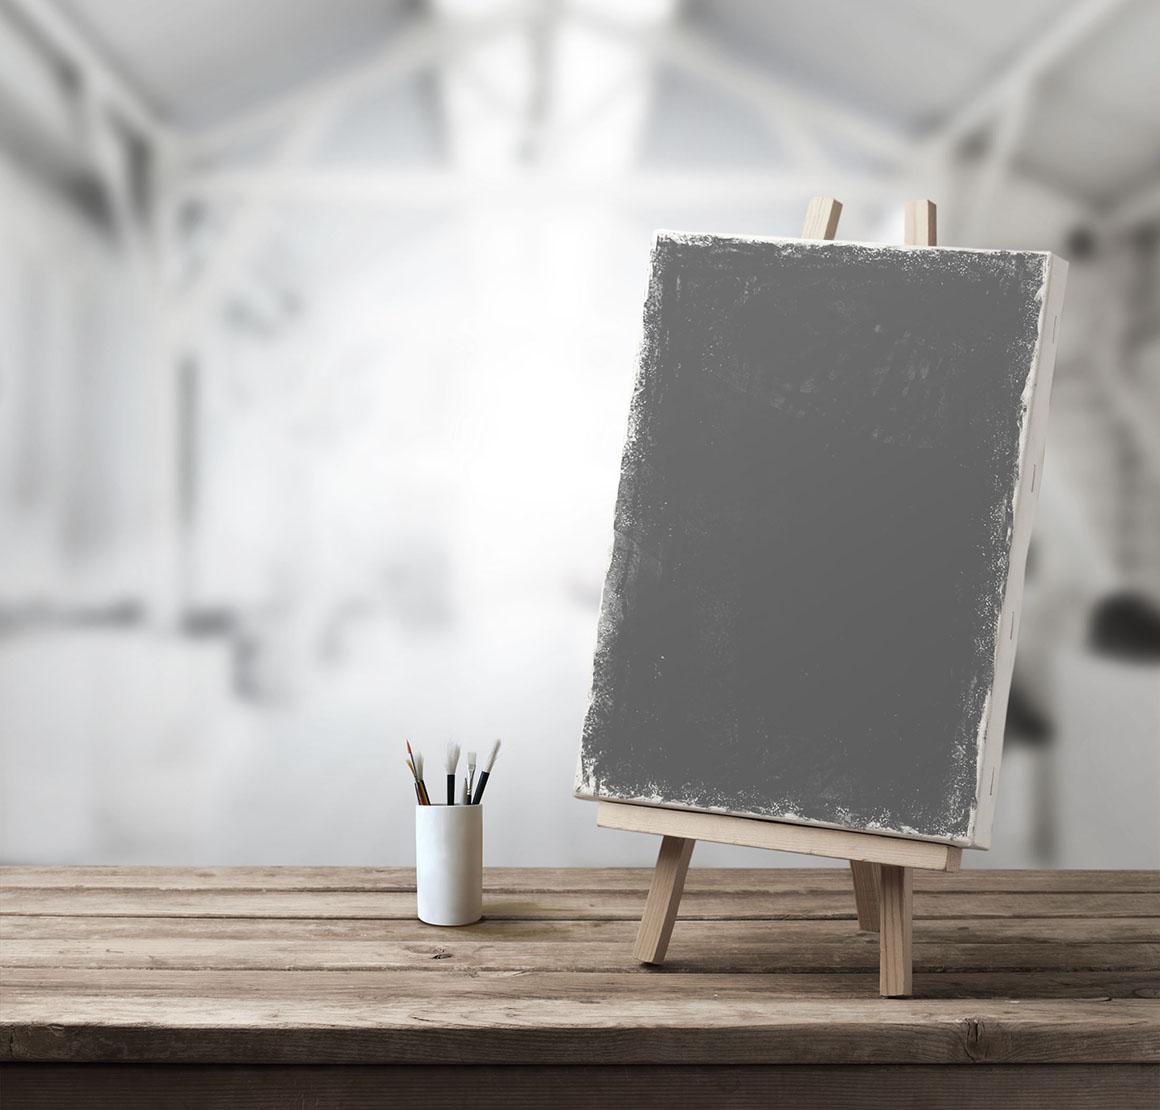 16_Oil-Paint-artwork-FX-adobe-photoshop-actions-Script-Plugin.jpg